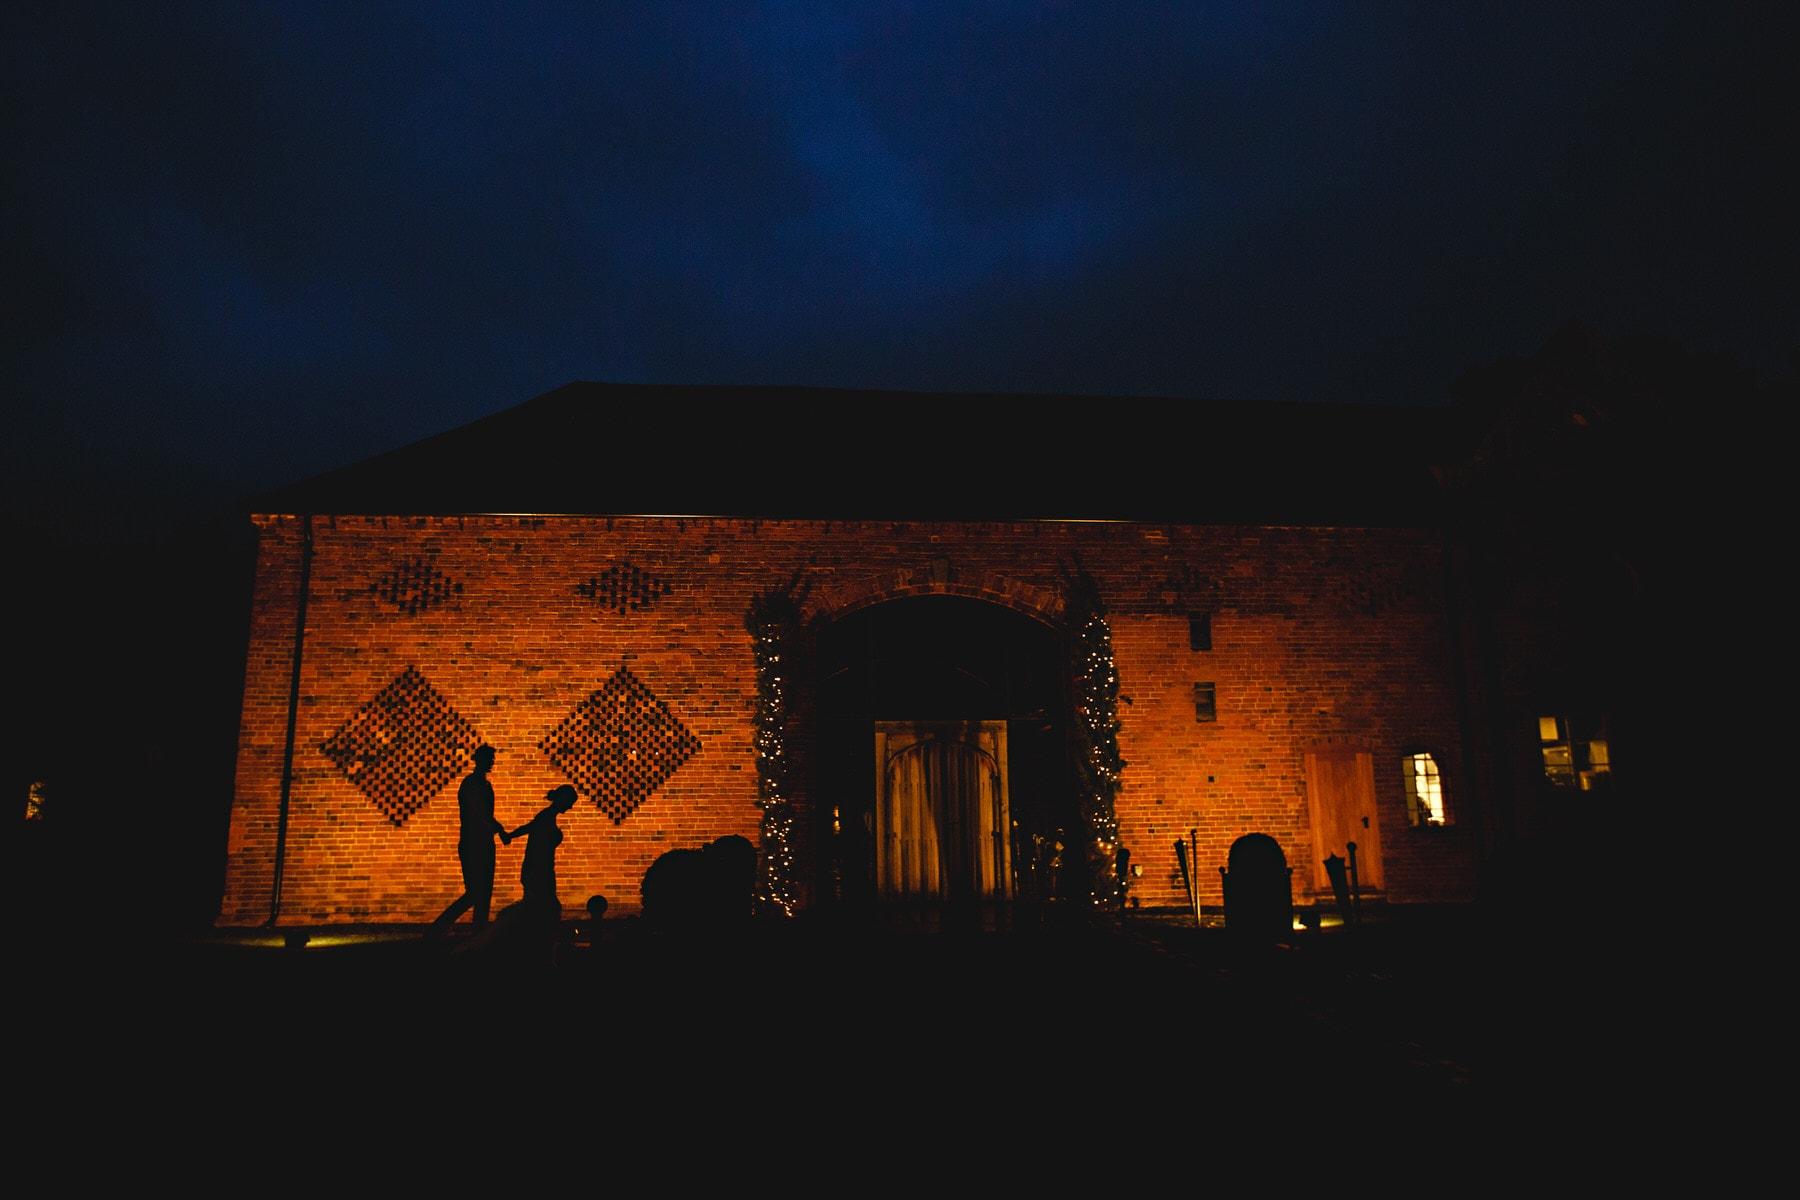 the orange brick shustoke building at night